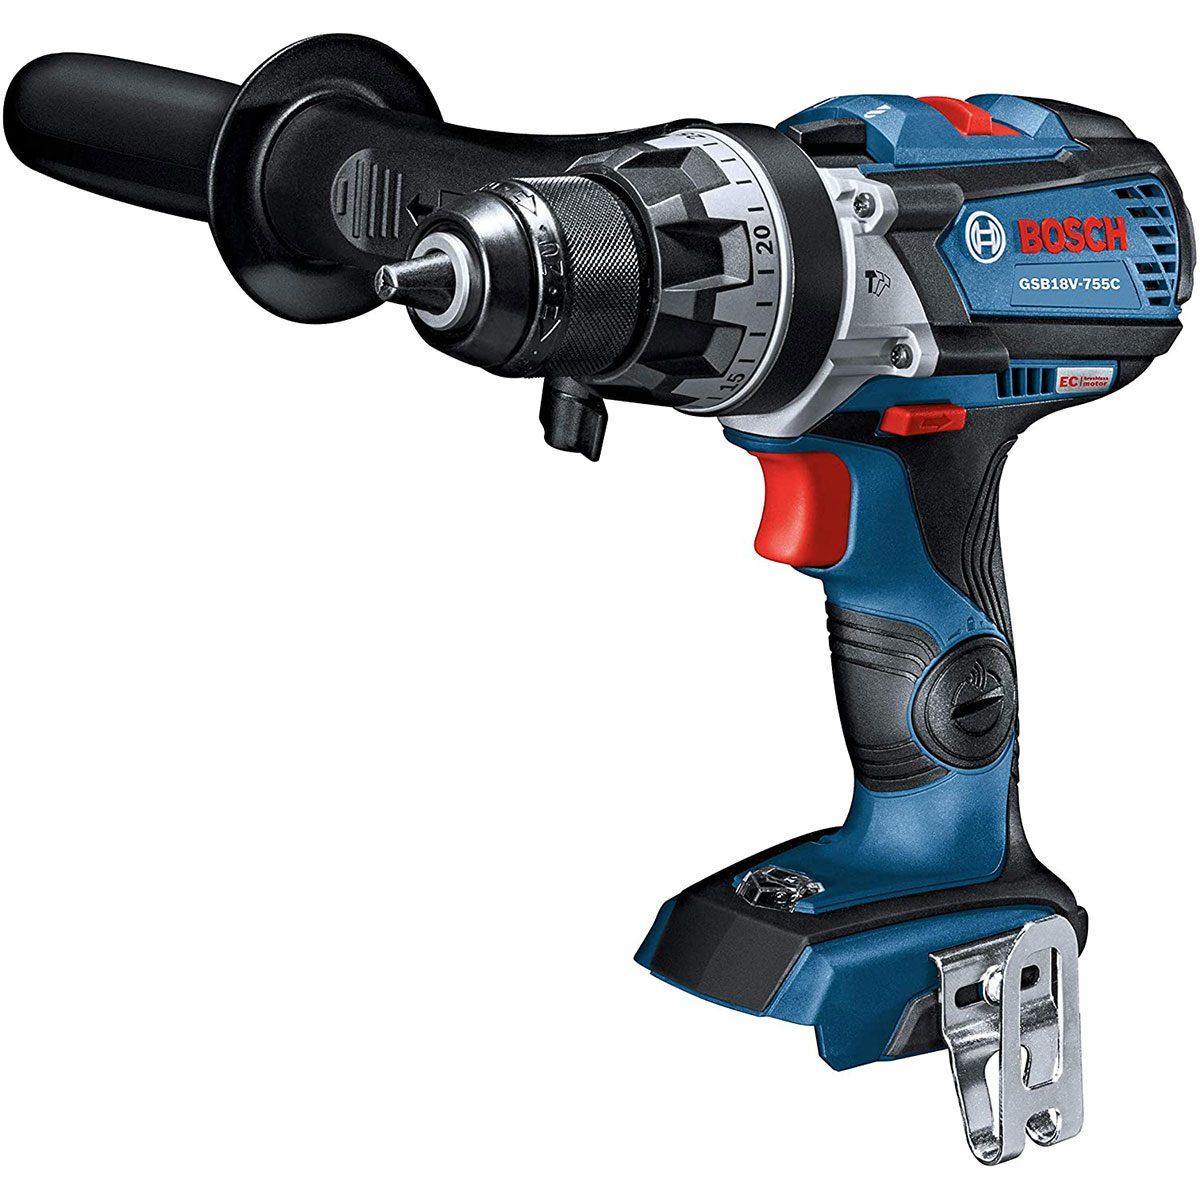 Bosch bluetooth hammer drill